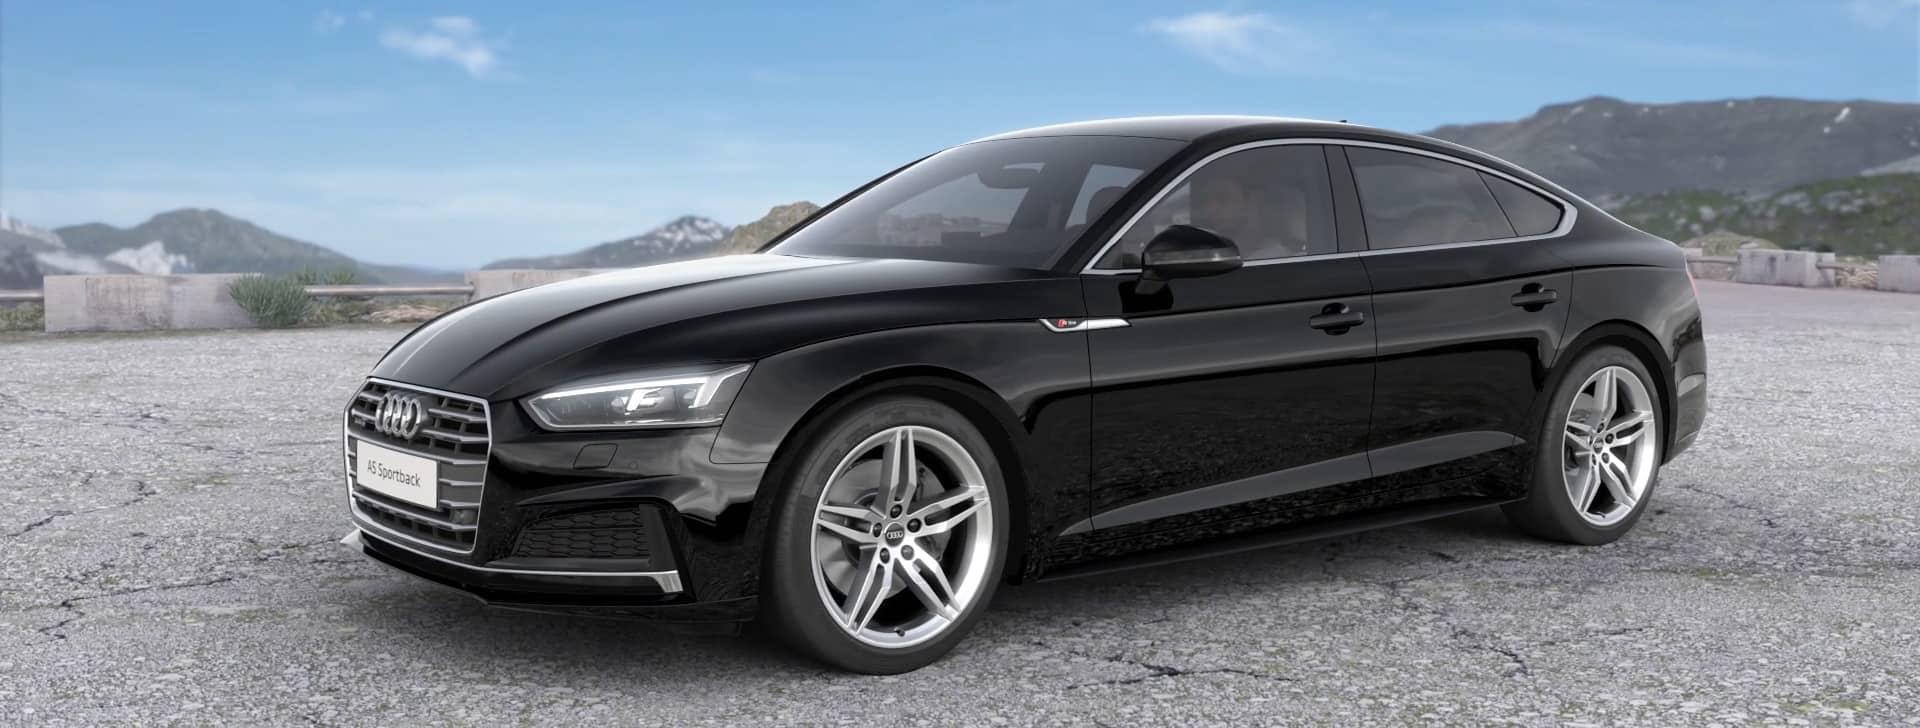 Audi A Sportback A Audi Qatar - Audi a5